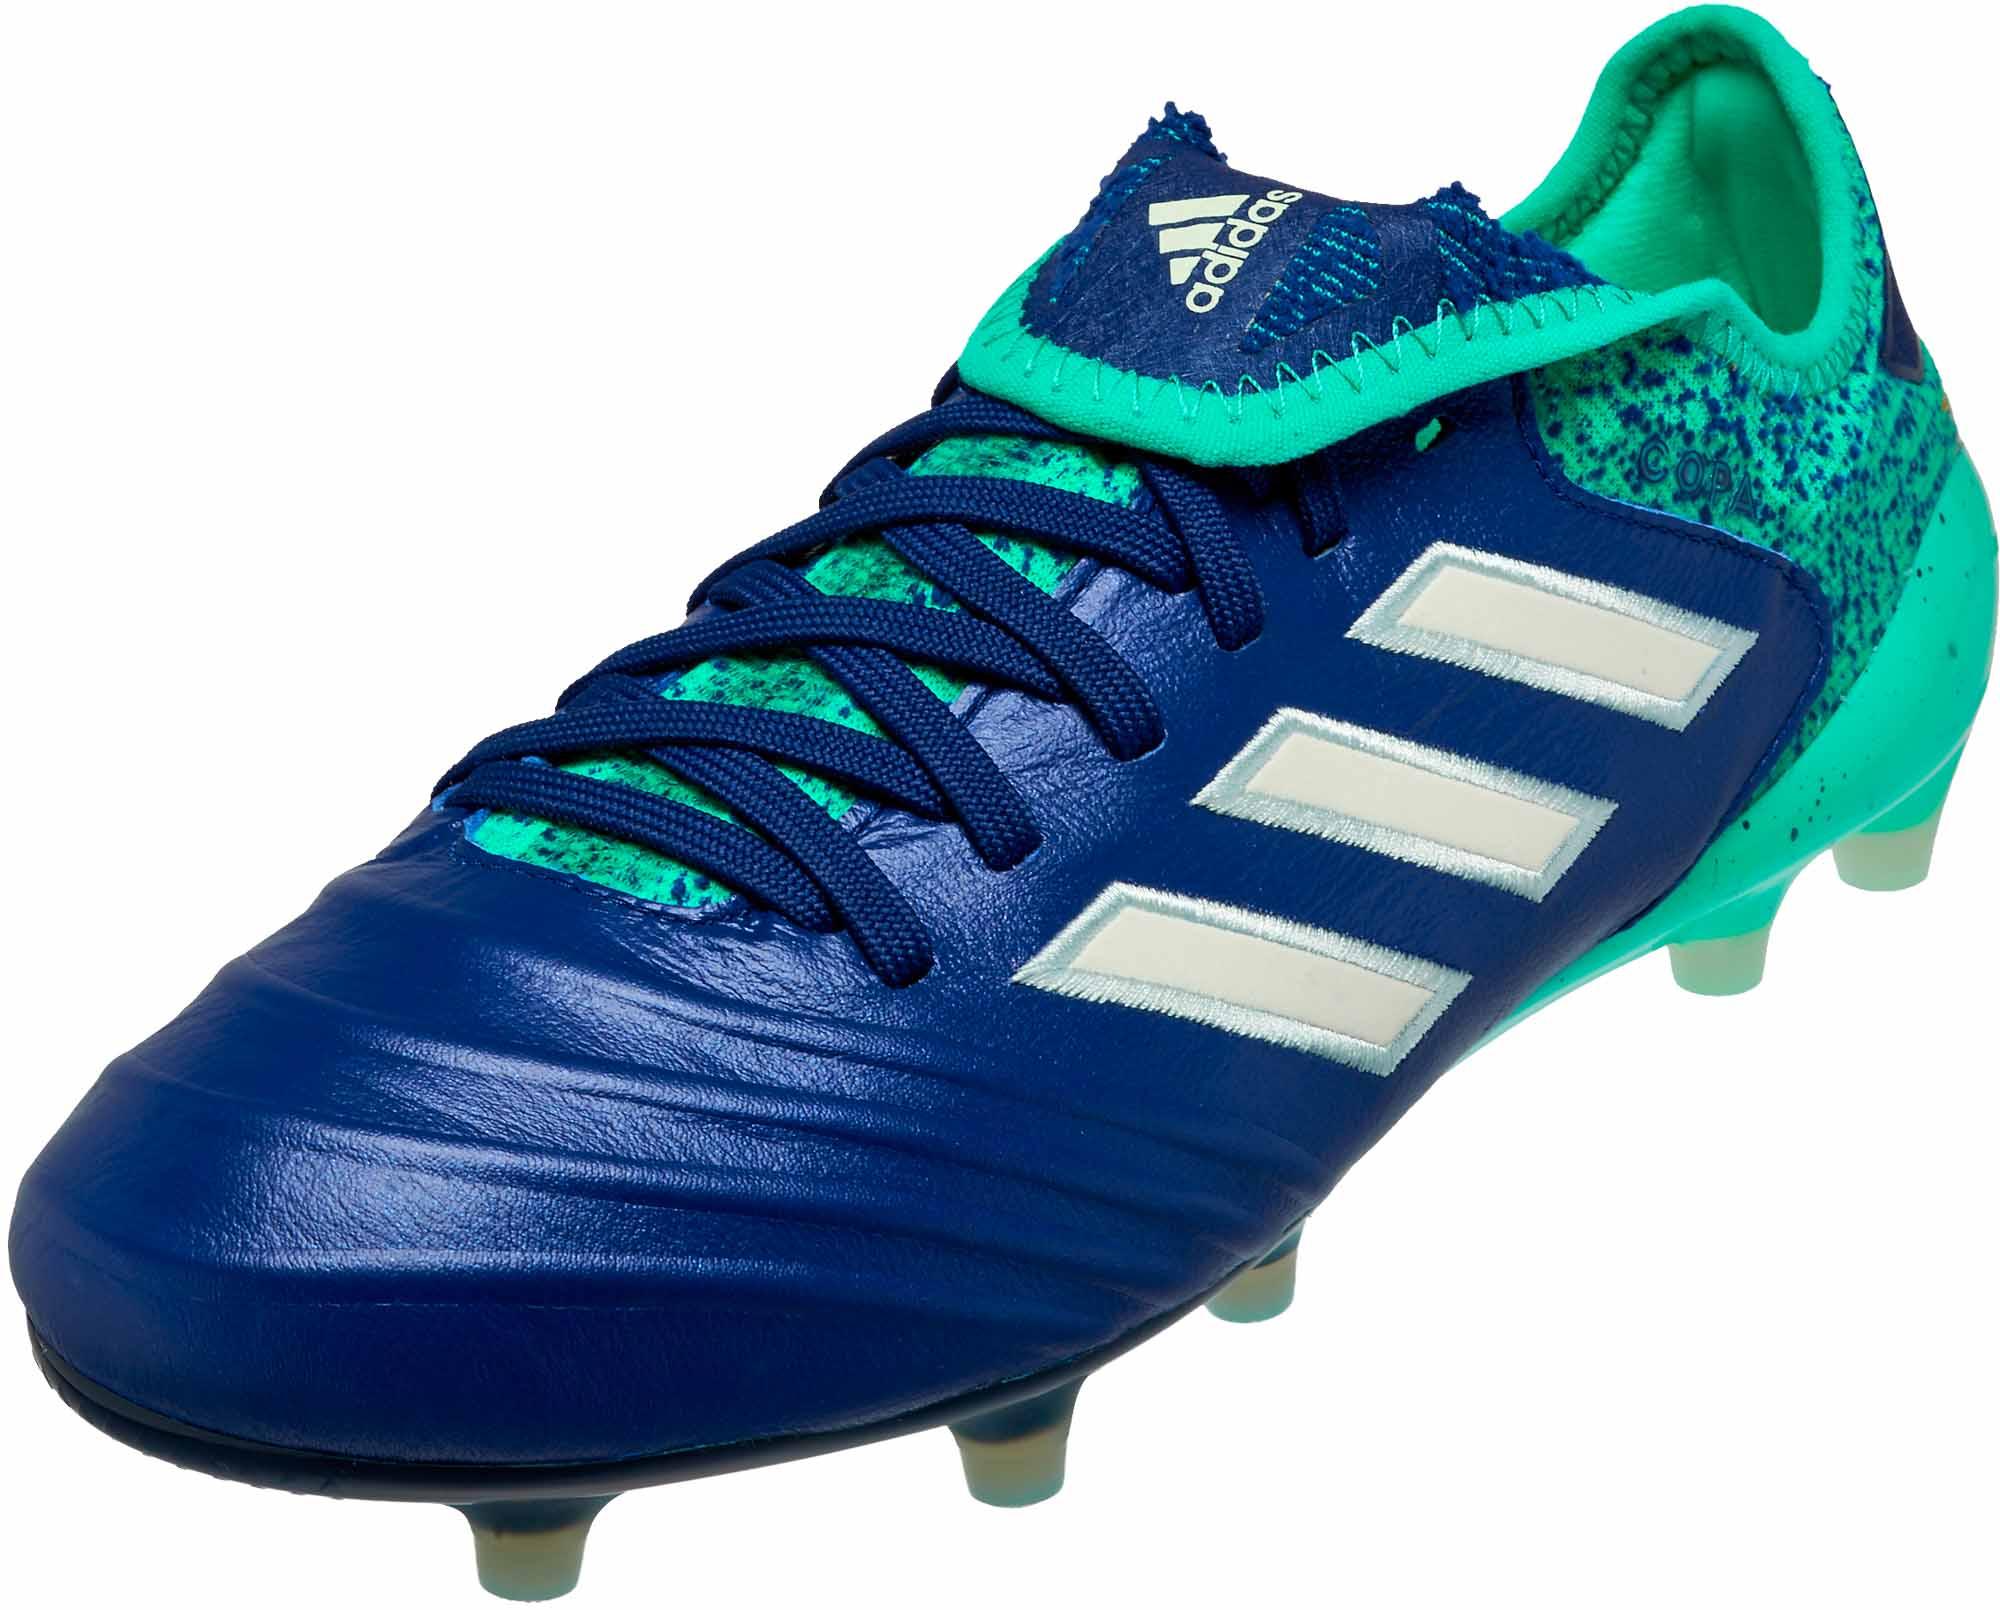 adidas Copa 18.1 FG - Unity Ink  Aero Green - Soccer Master